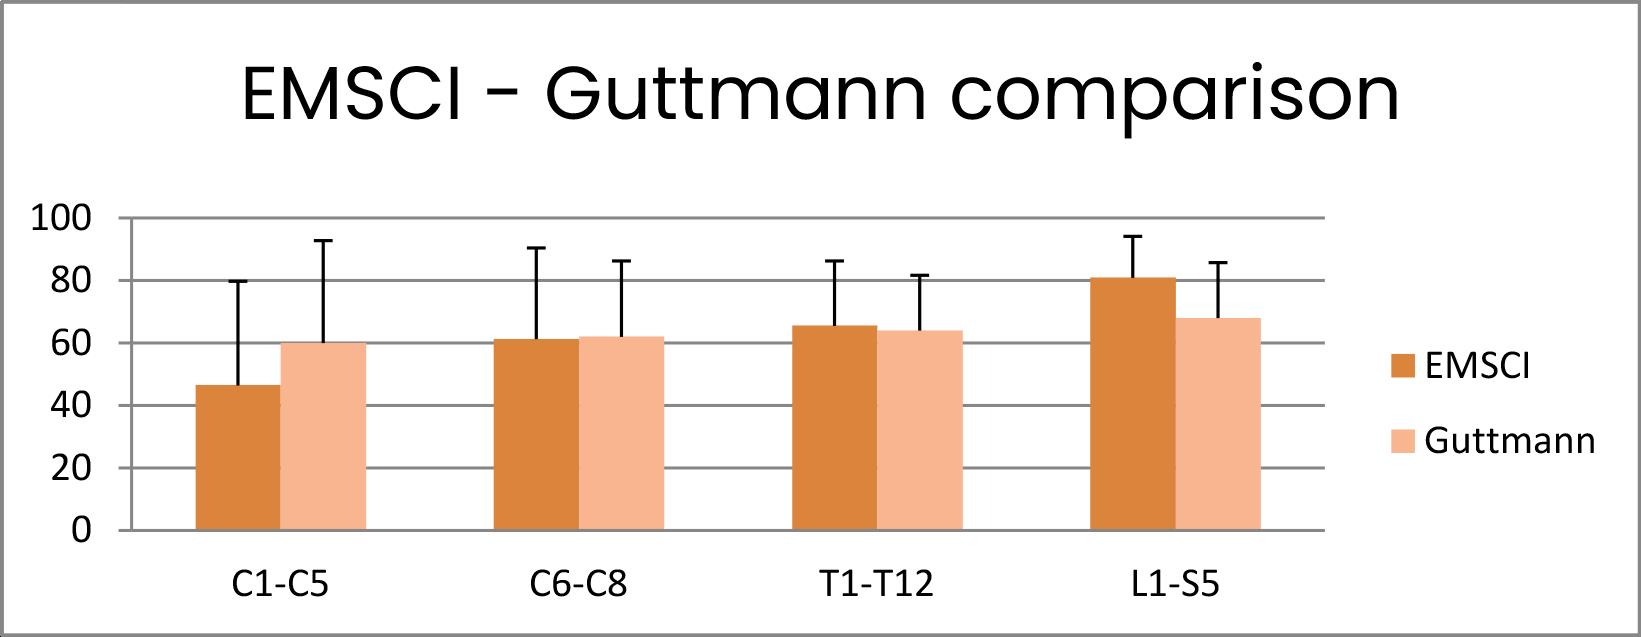 Comparació EMSCI - Guttmann